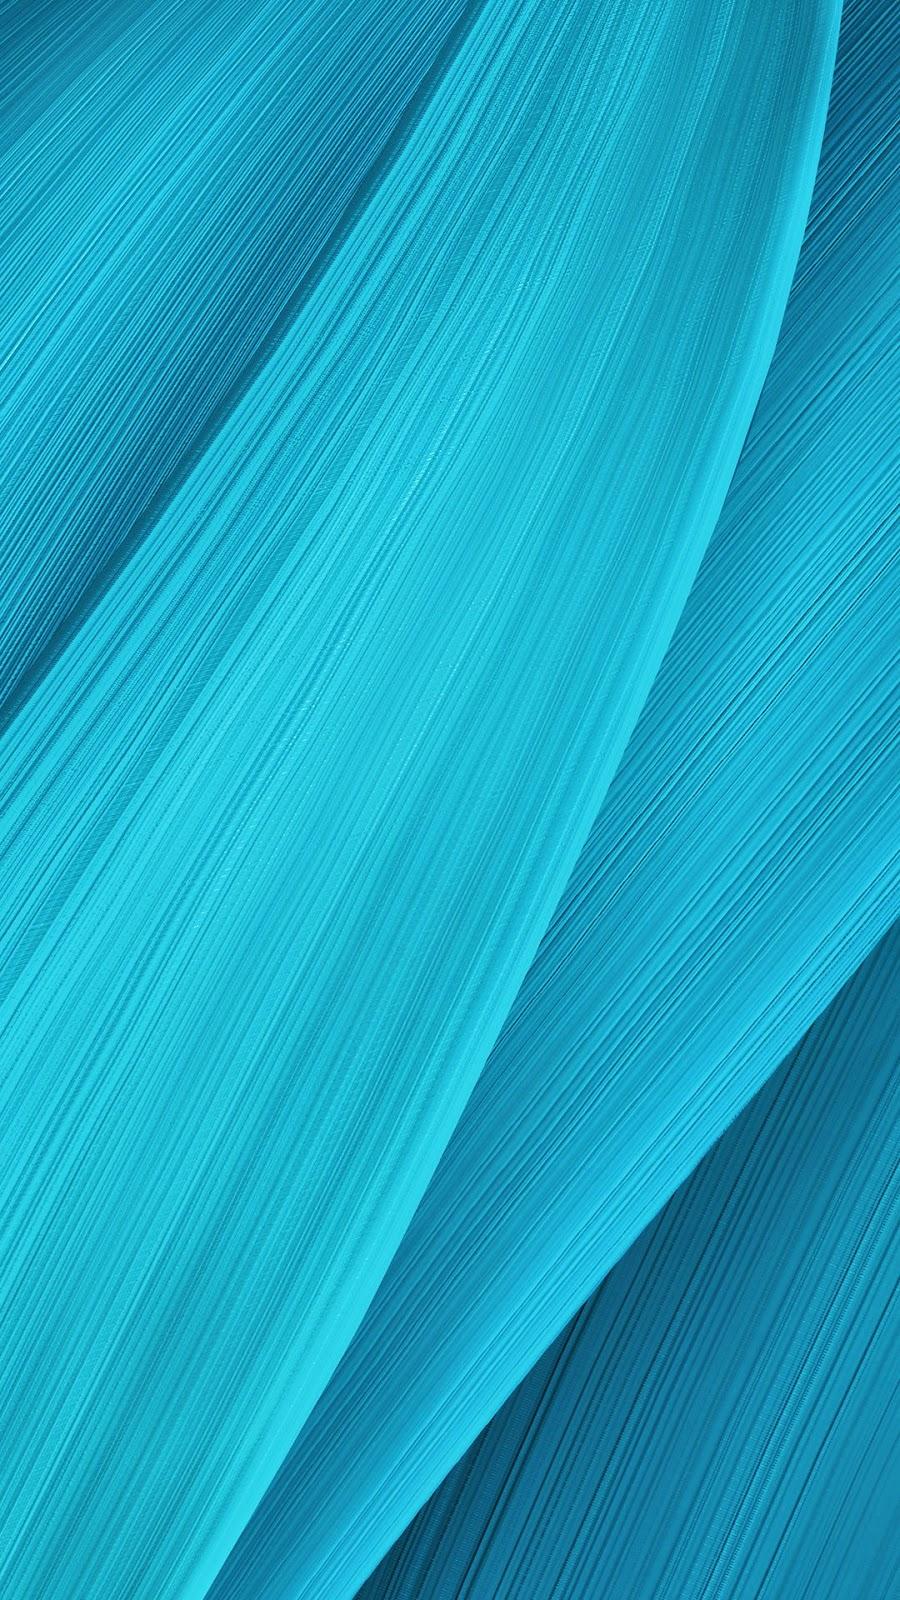 Blue Apple Wallpaper Iphone Asus Zenfone 2 Wallpaper Asus Zenfone Blog News Tips